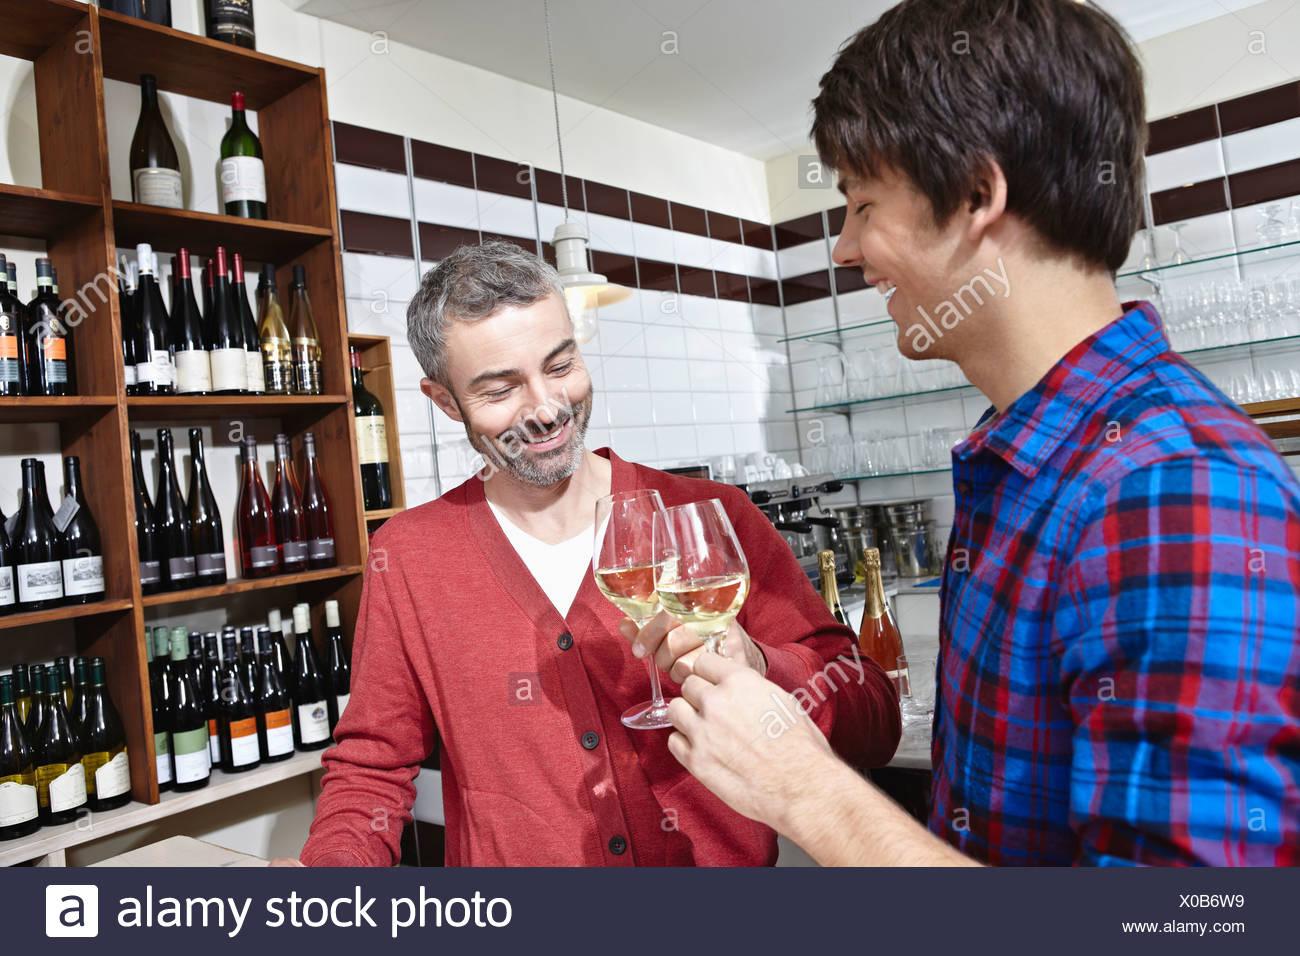 Germany, Cologne, Man having wine, smiling - Stock Image